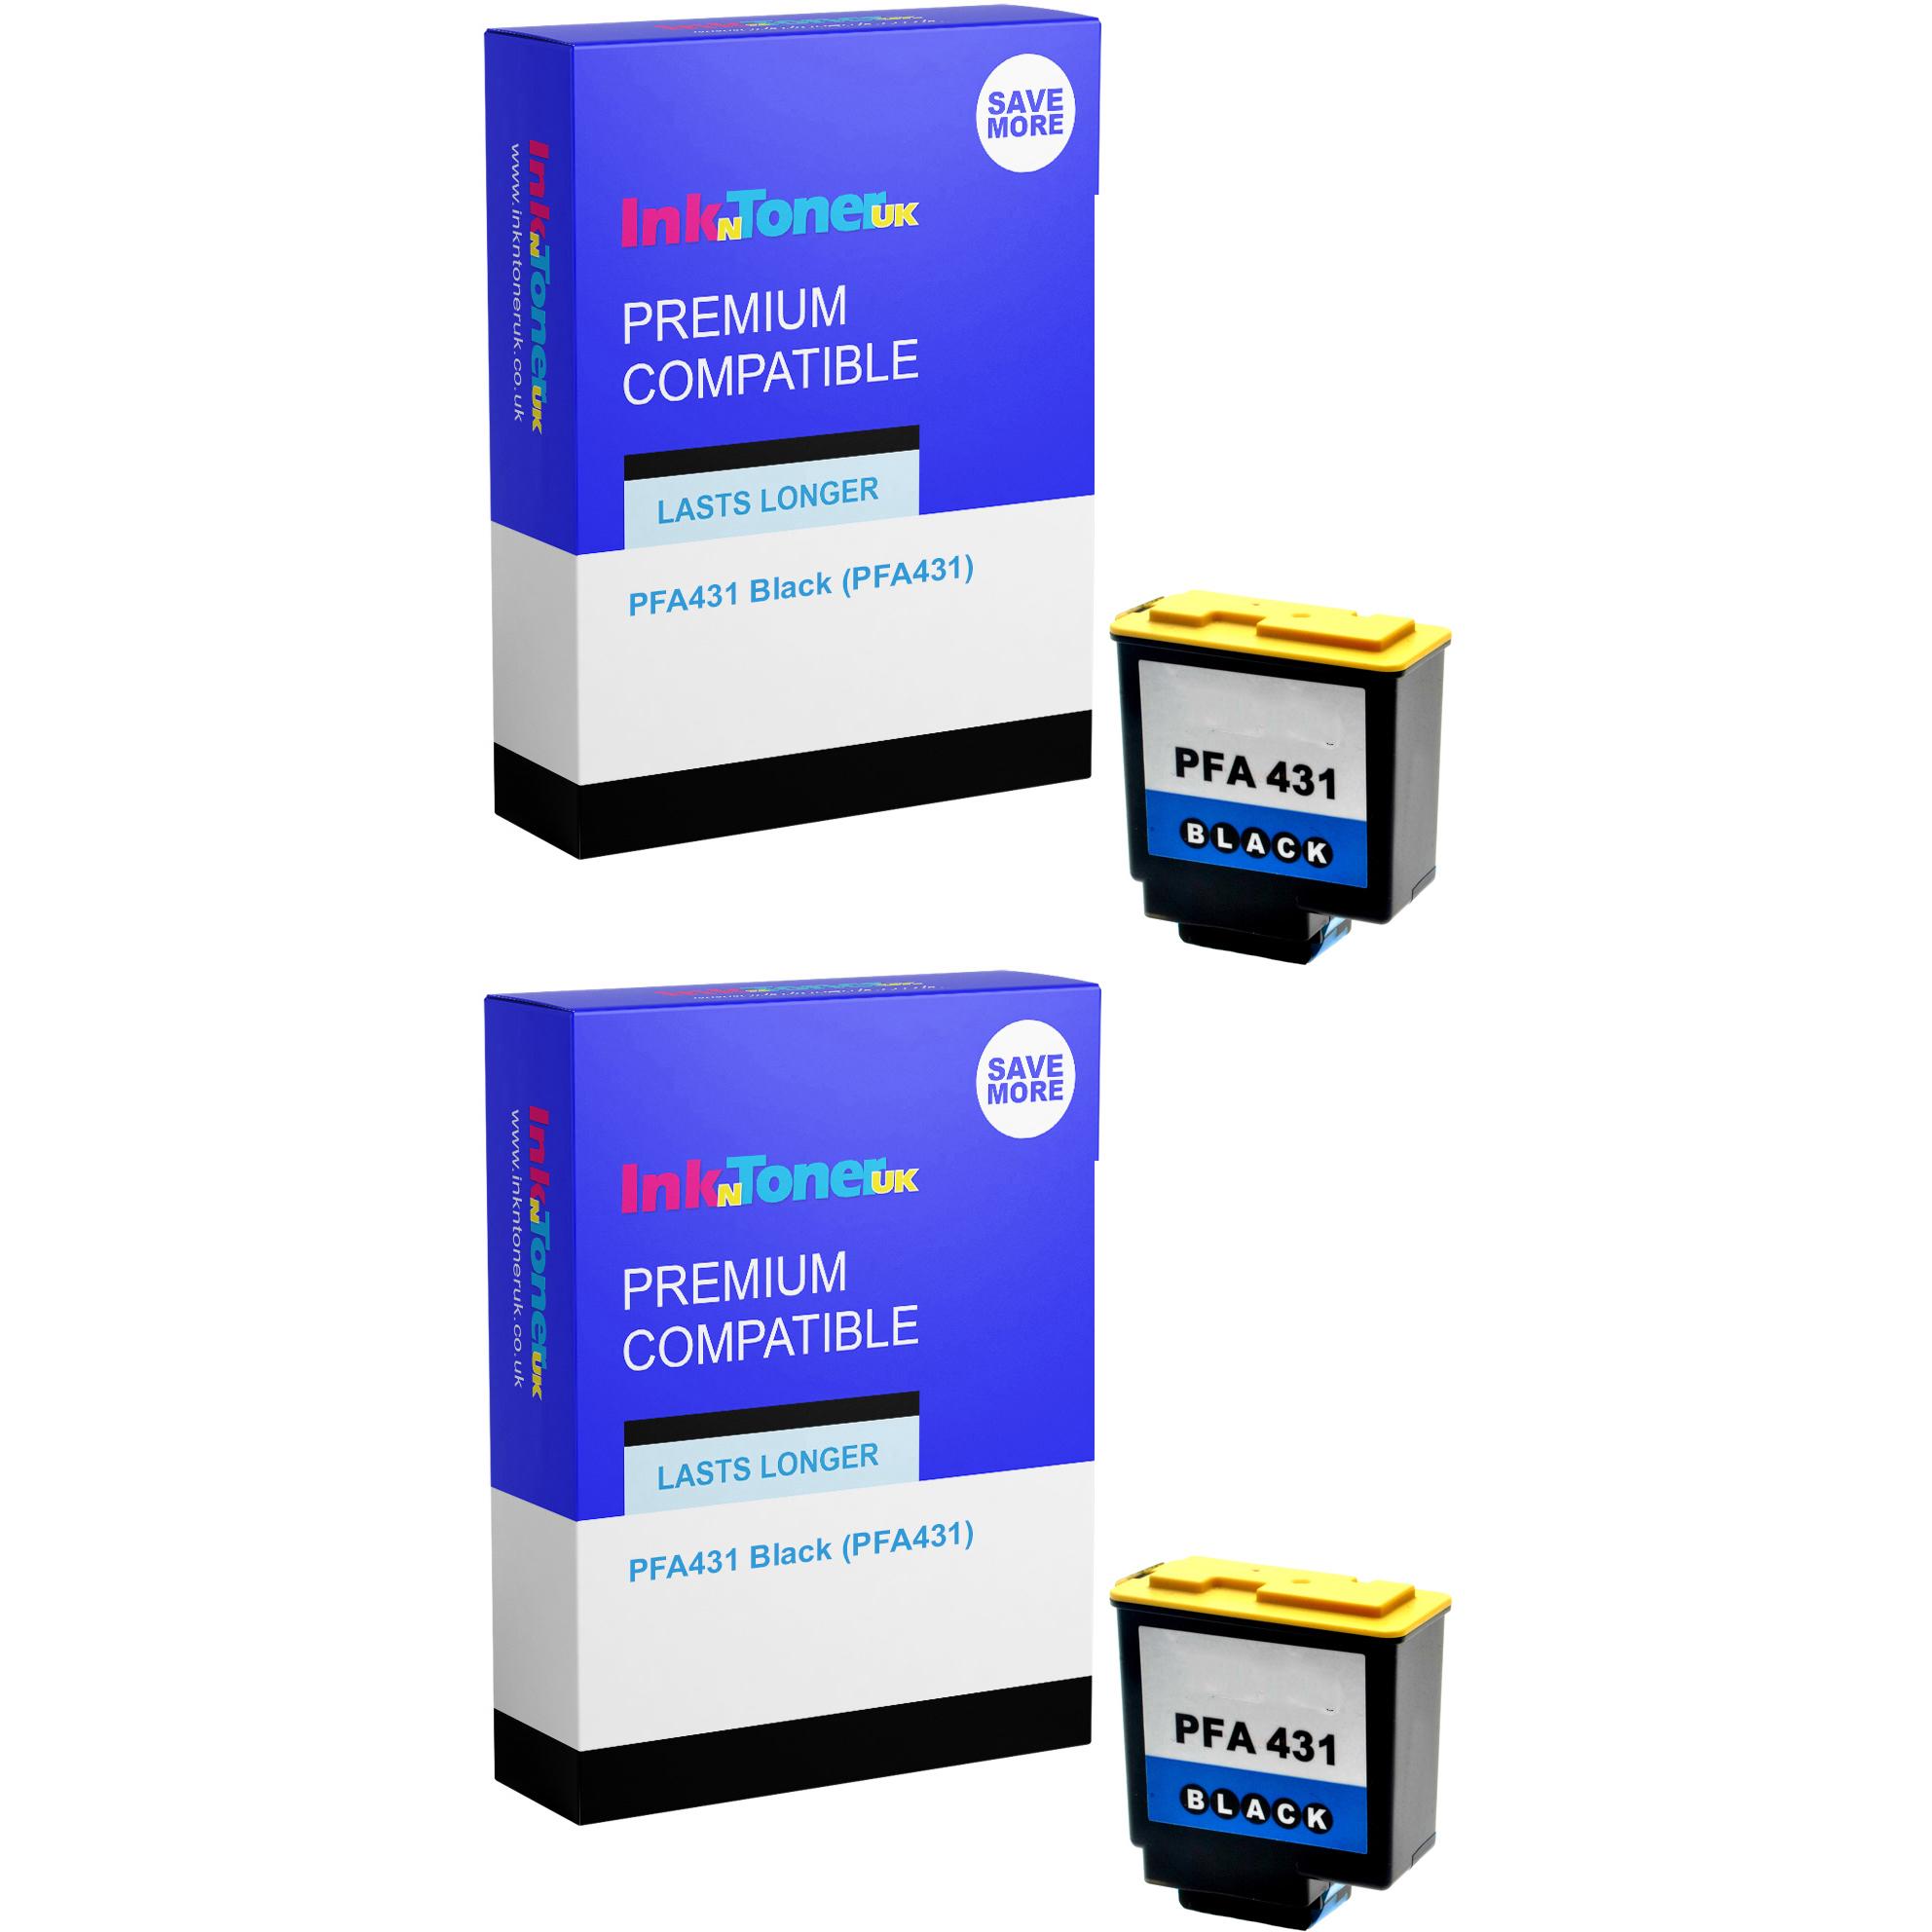 Premium Compatible Philips PFA431 Black Twin Pack Ink Cartridges (PFA431)